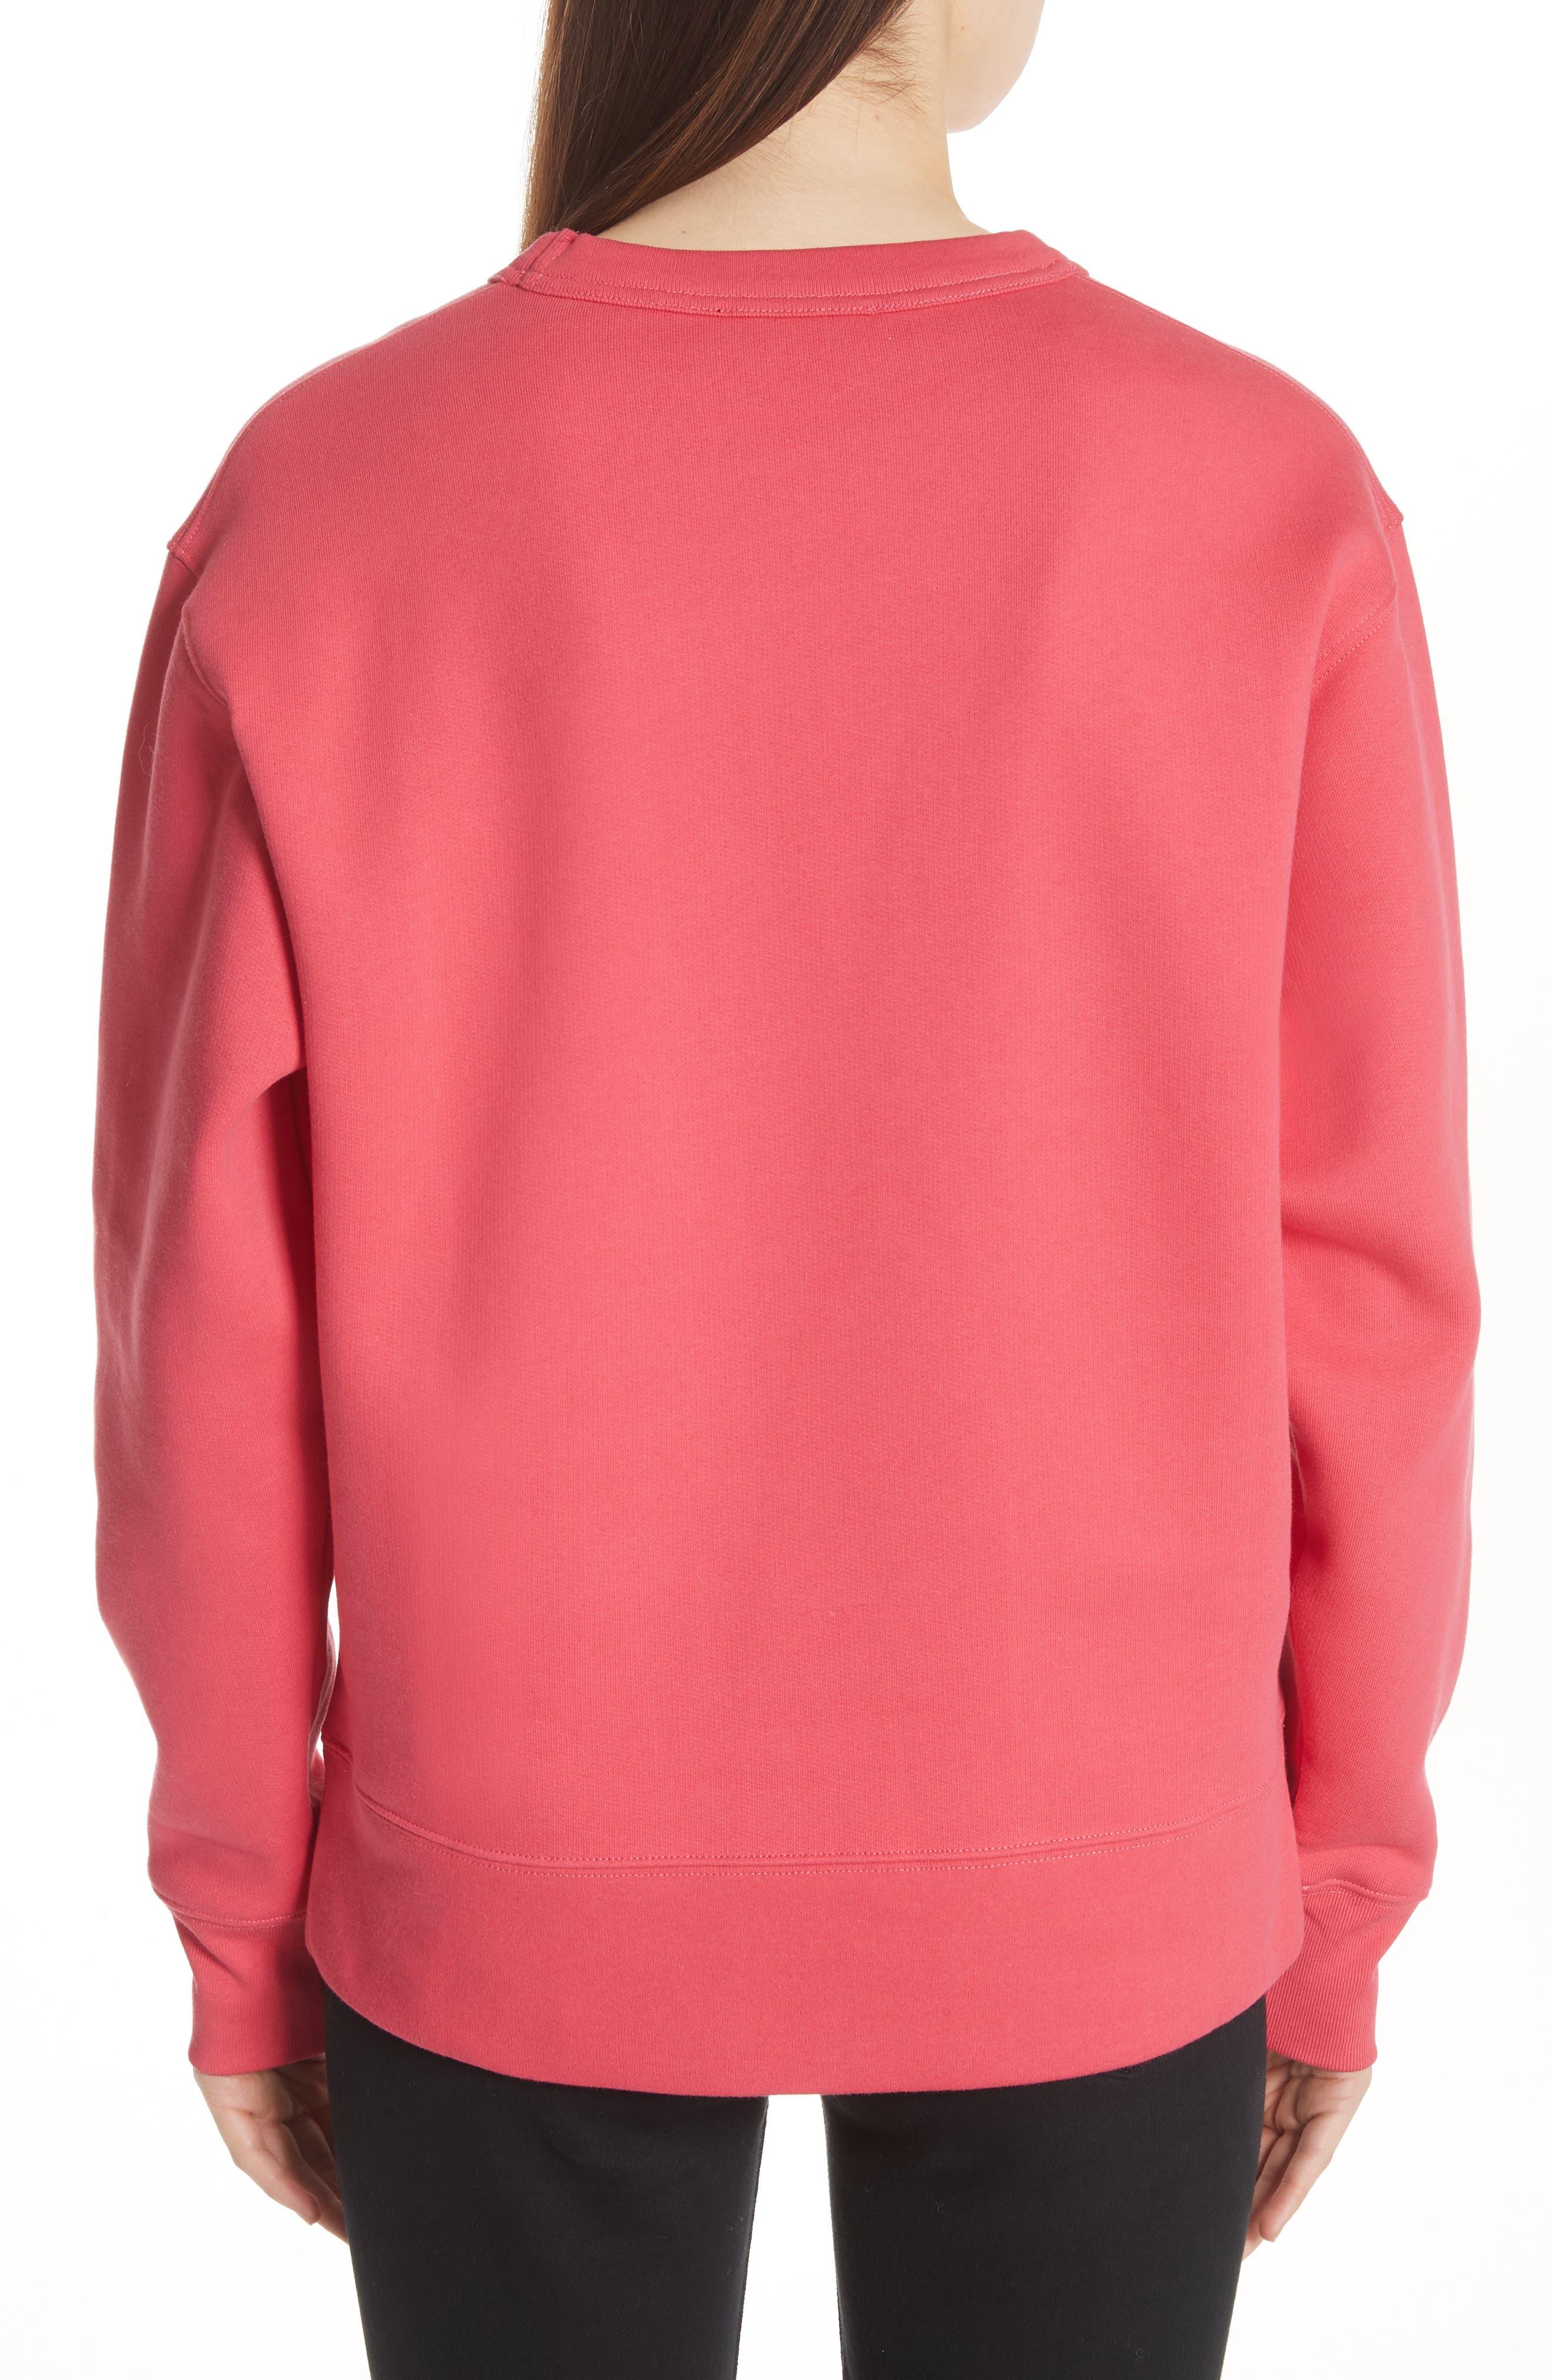 Fairview Crewneck Sweatshirt,                             Alternate thumbnail 2, color,                             Neon Pink